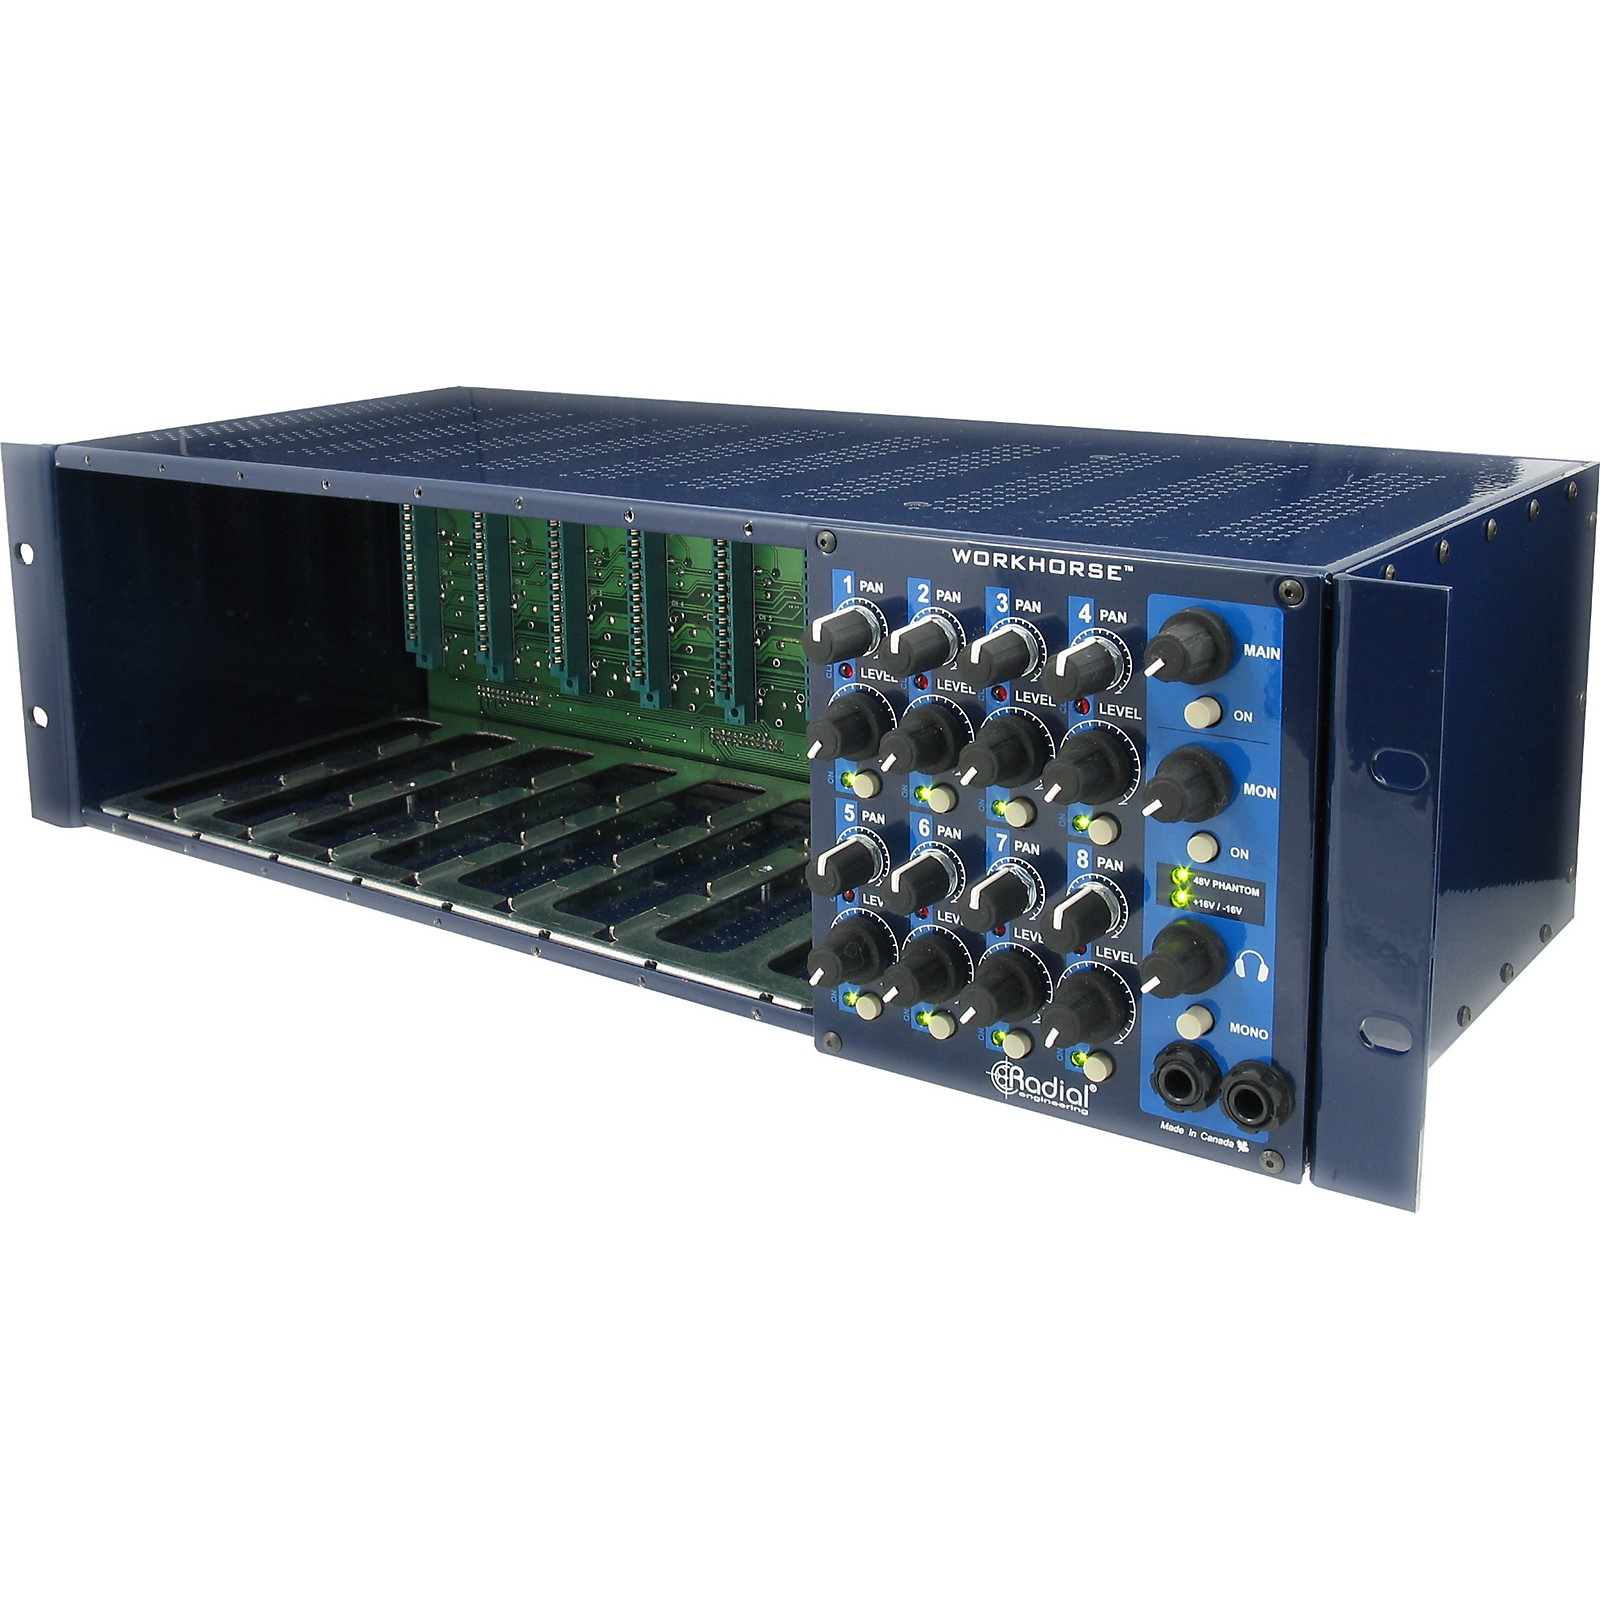 Radial Engineering Workhorse 500 Series Rack and Mixer